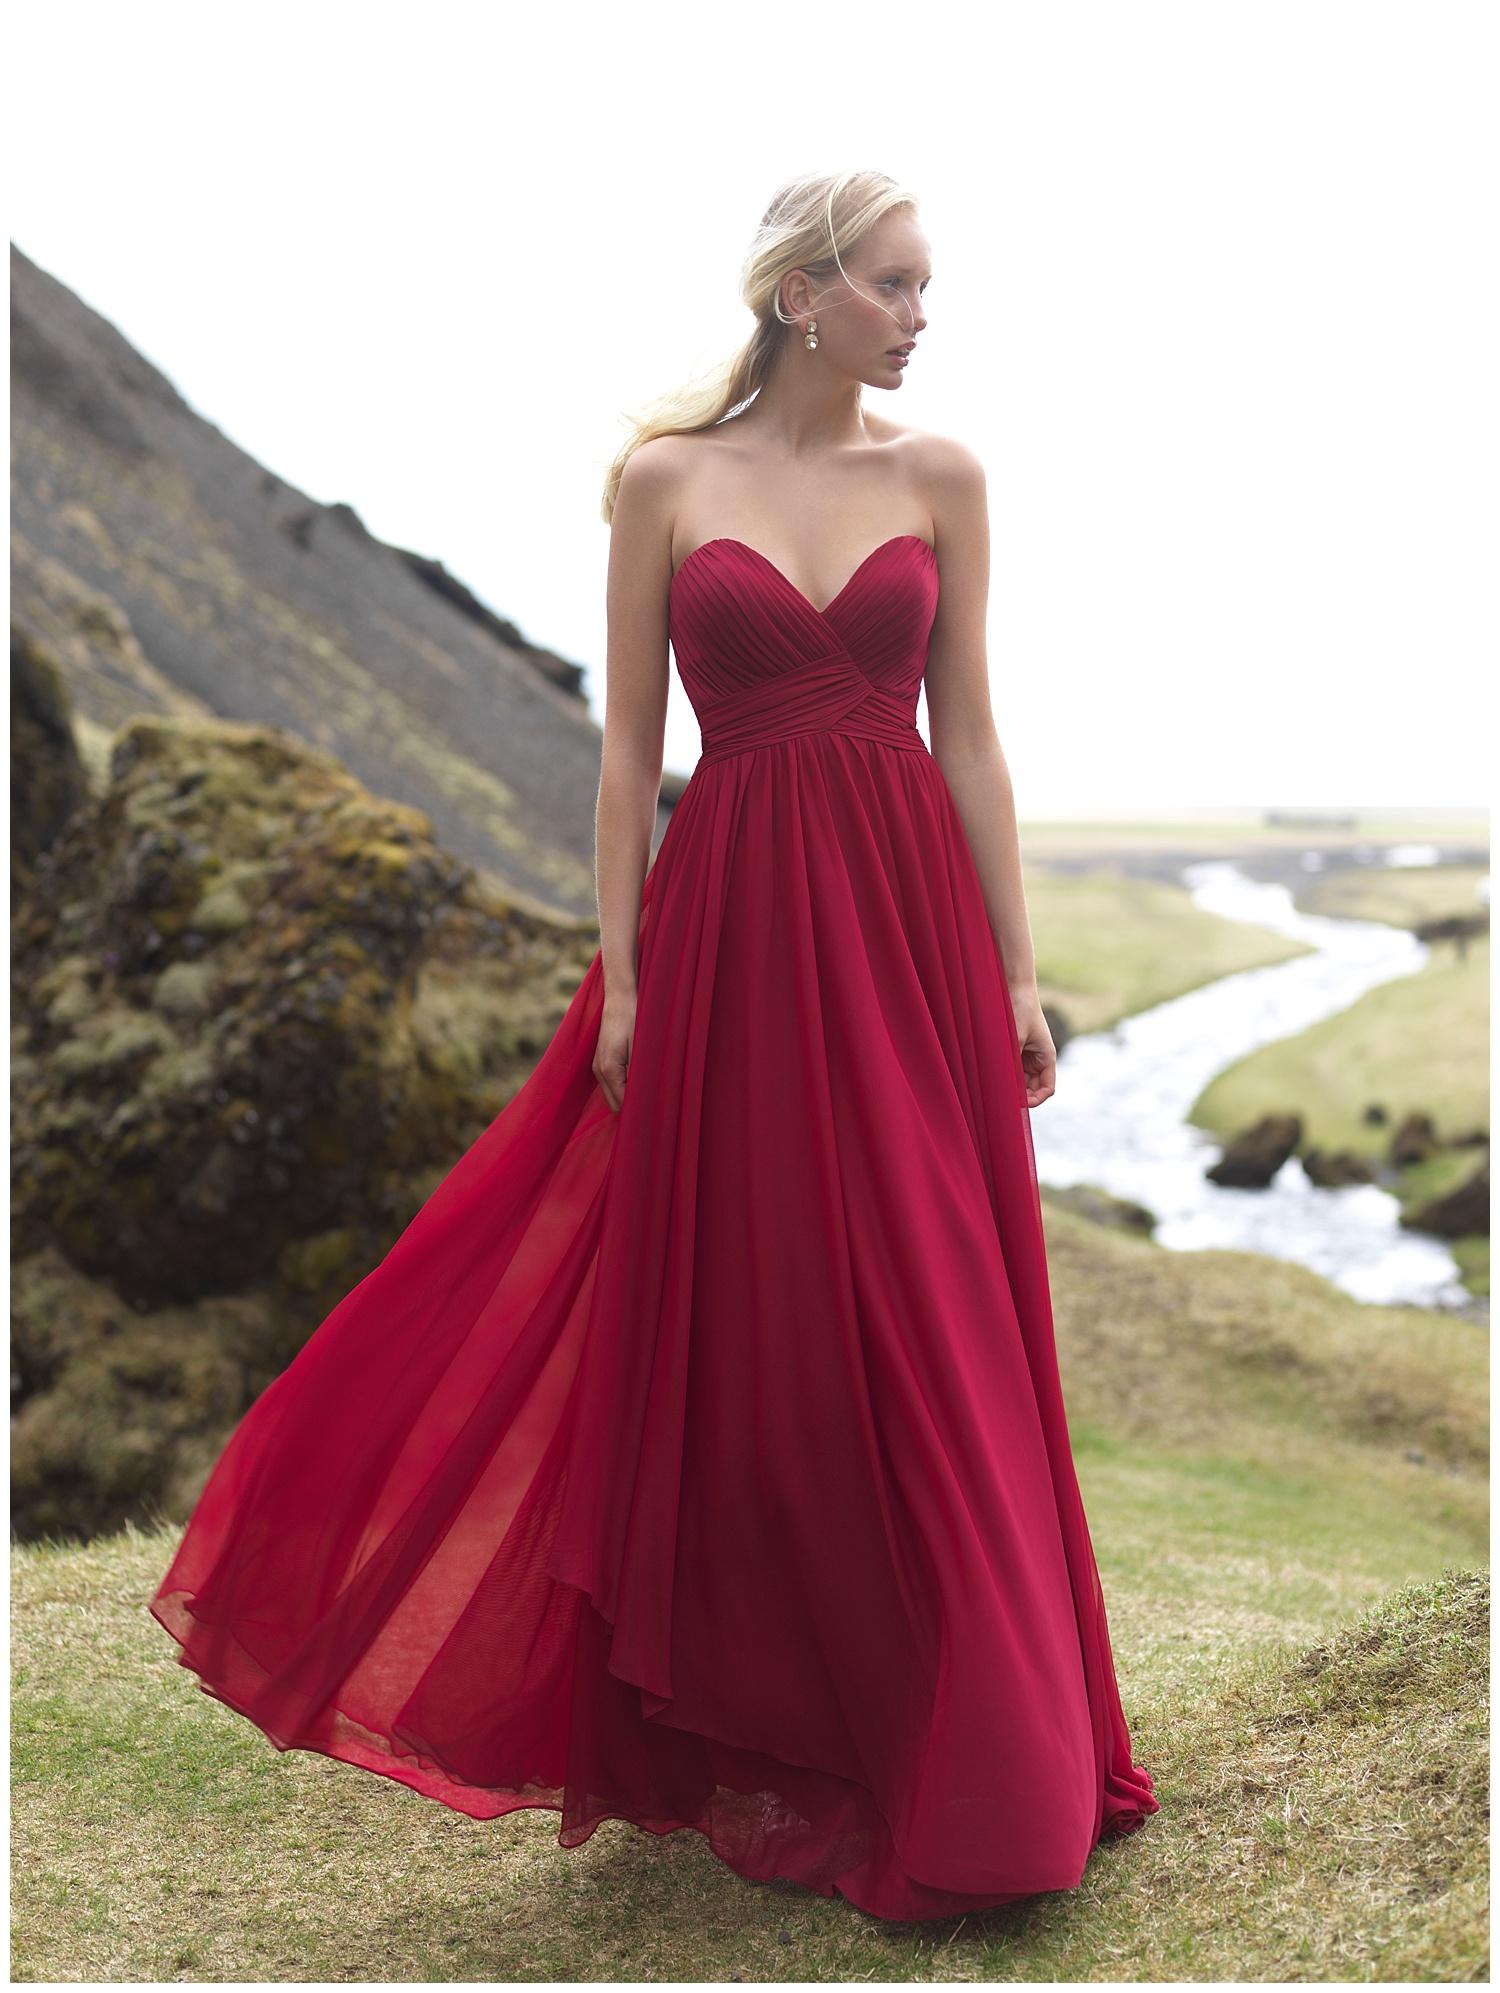 allure-bridesmaid-strapless-red-dress.jpg